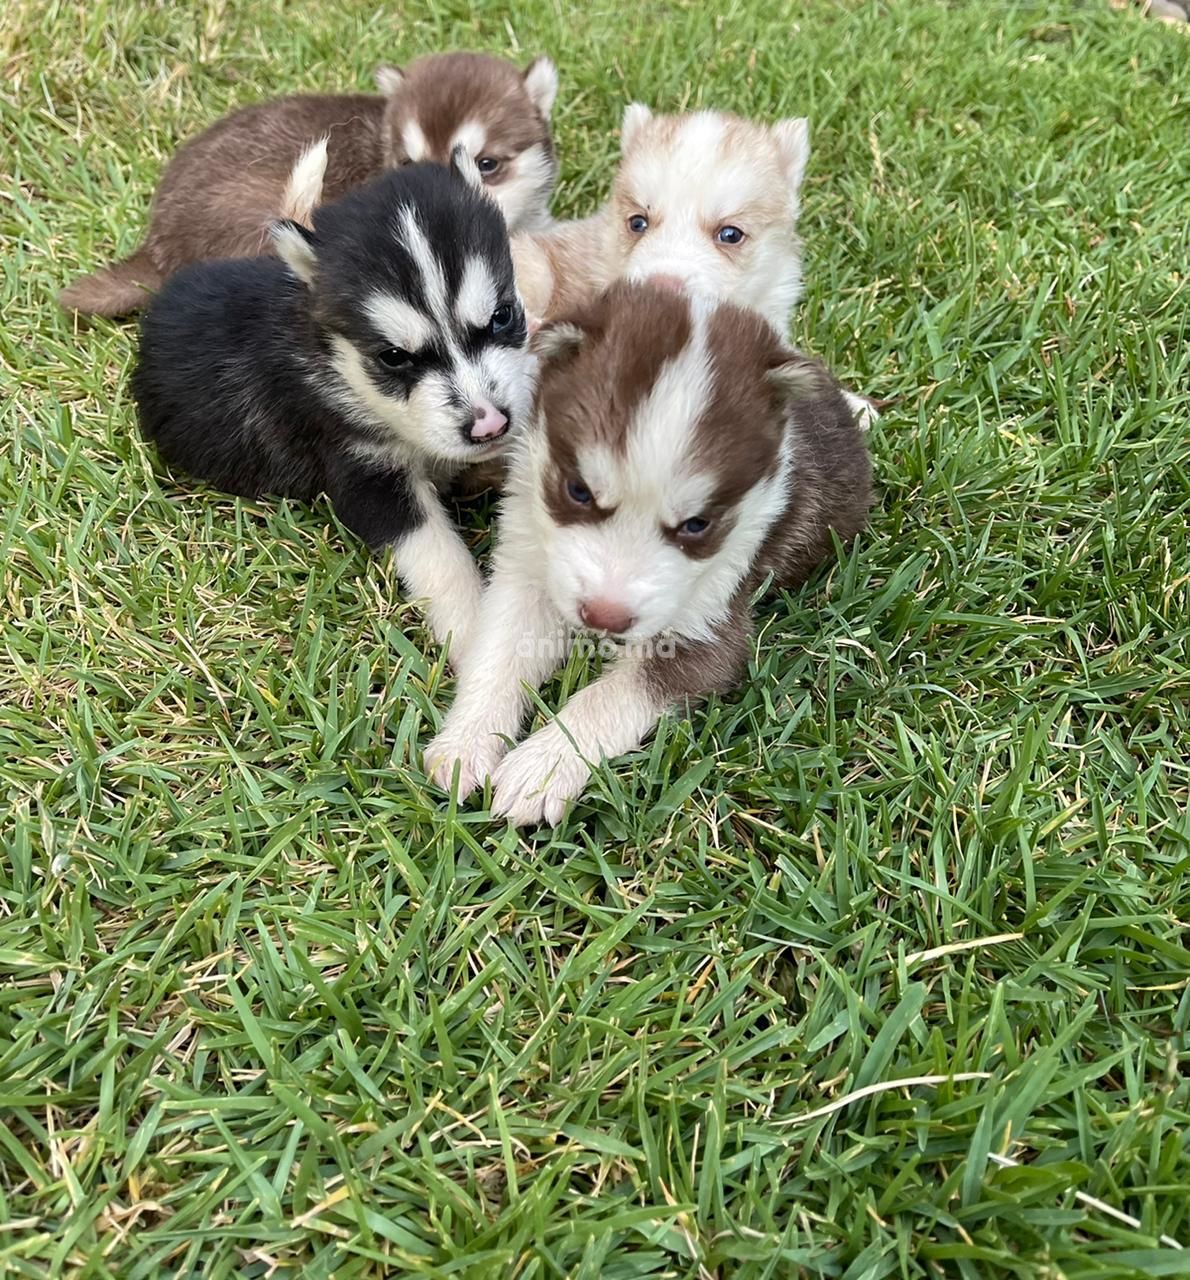 Animo - Chiots husky a vendre